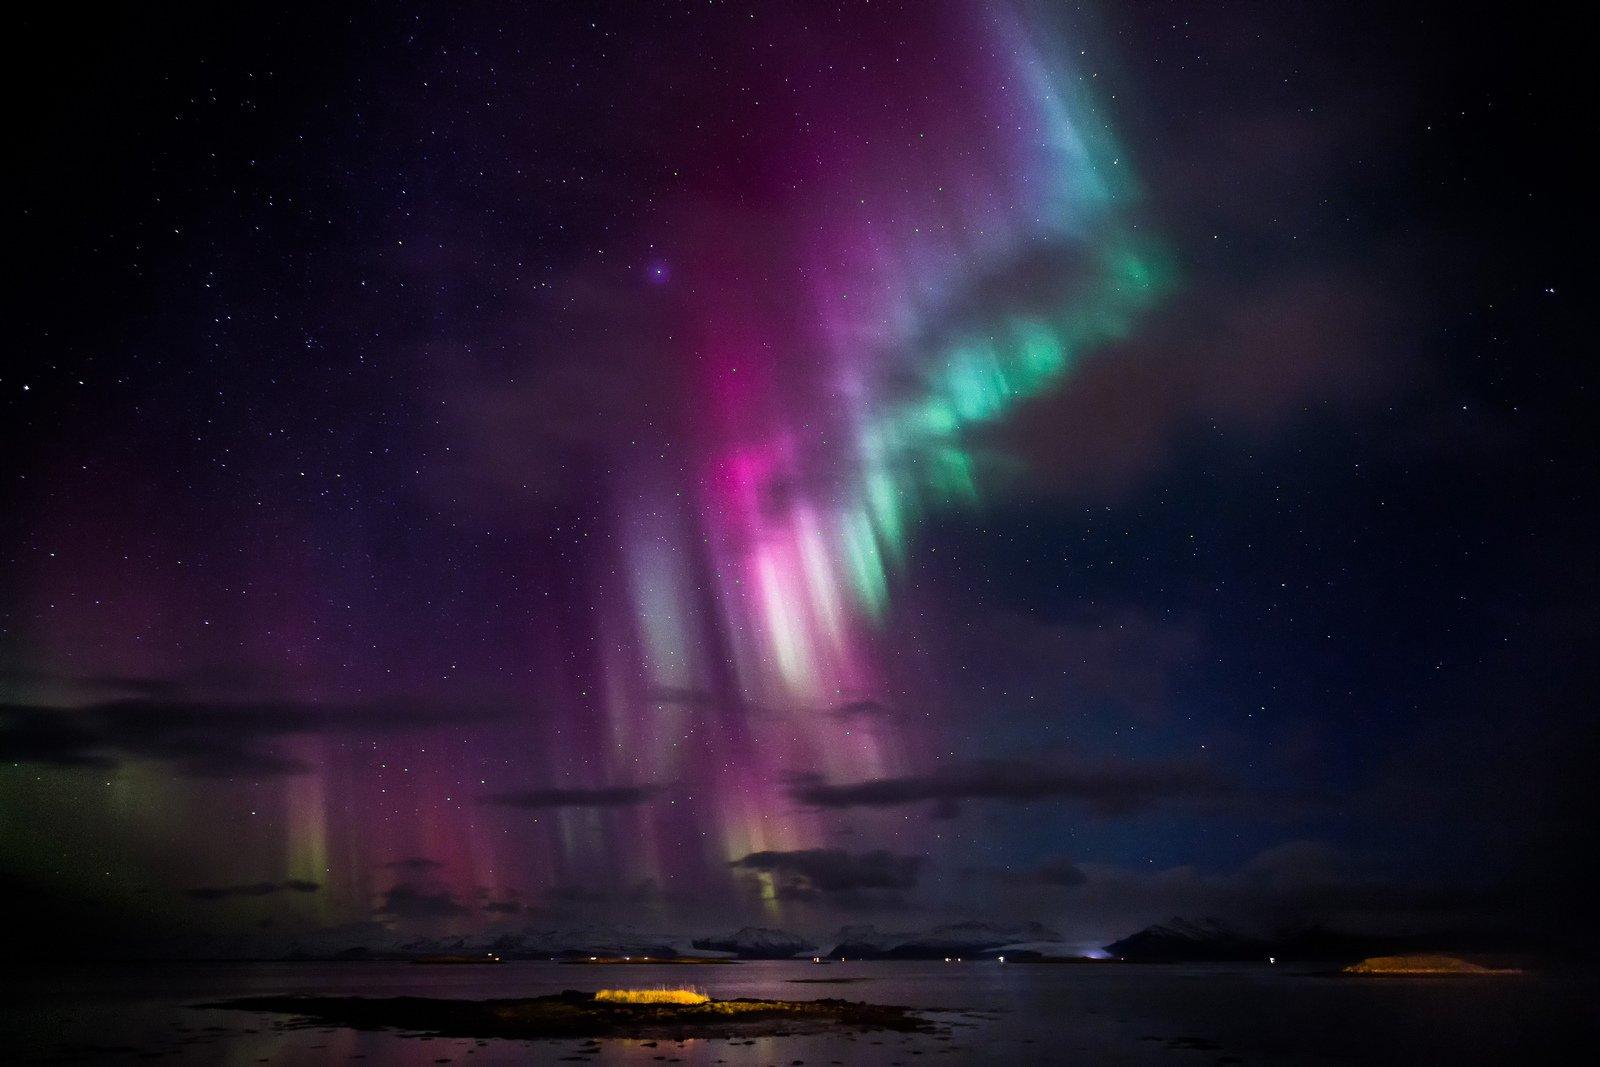 Alaska Artic Aurora Boreale Borealis Landscape Lights Nature Northern Outdoors Sky